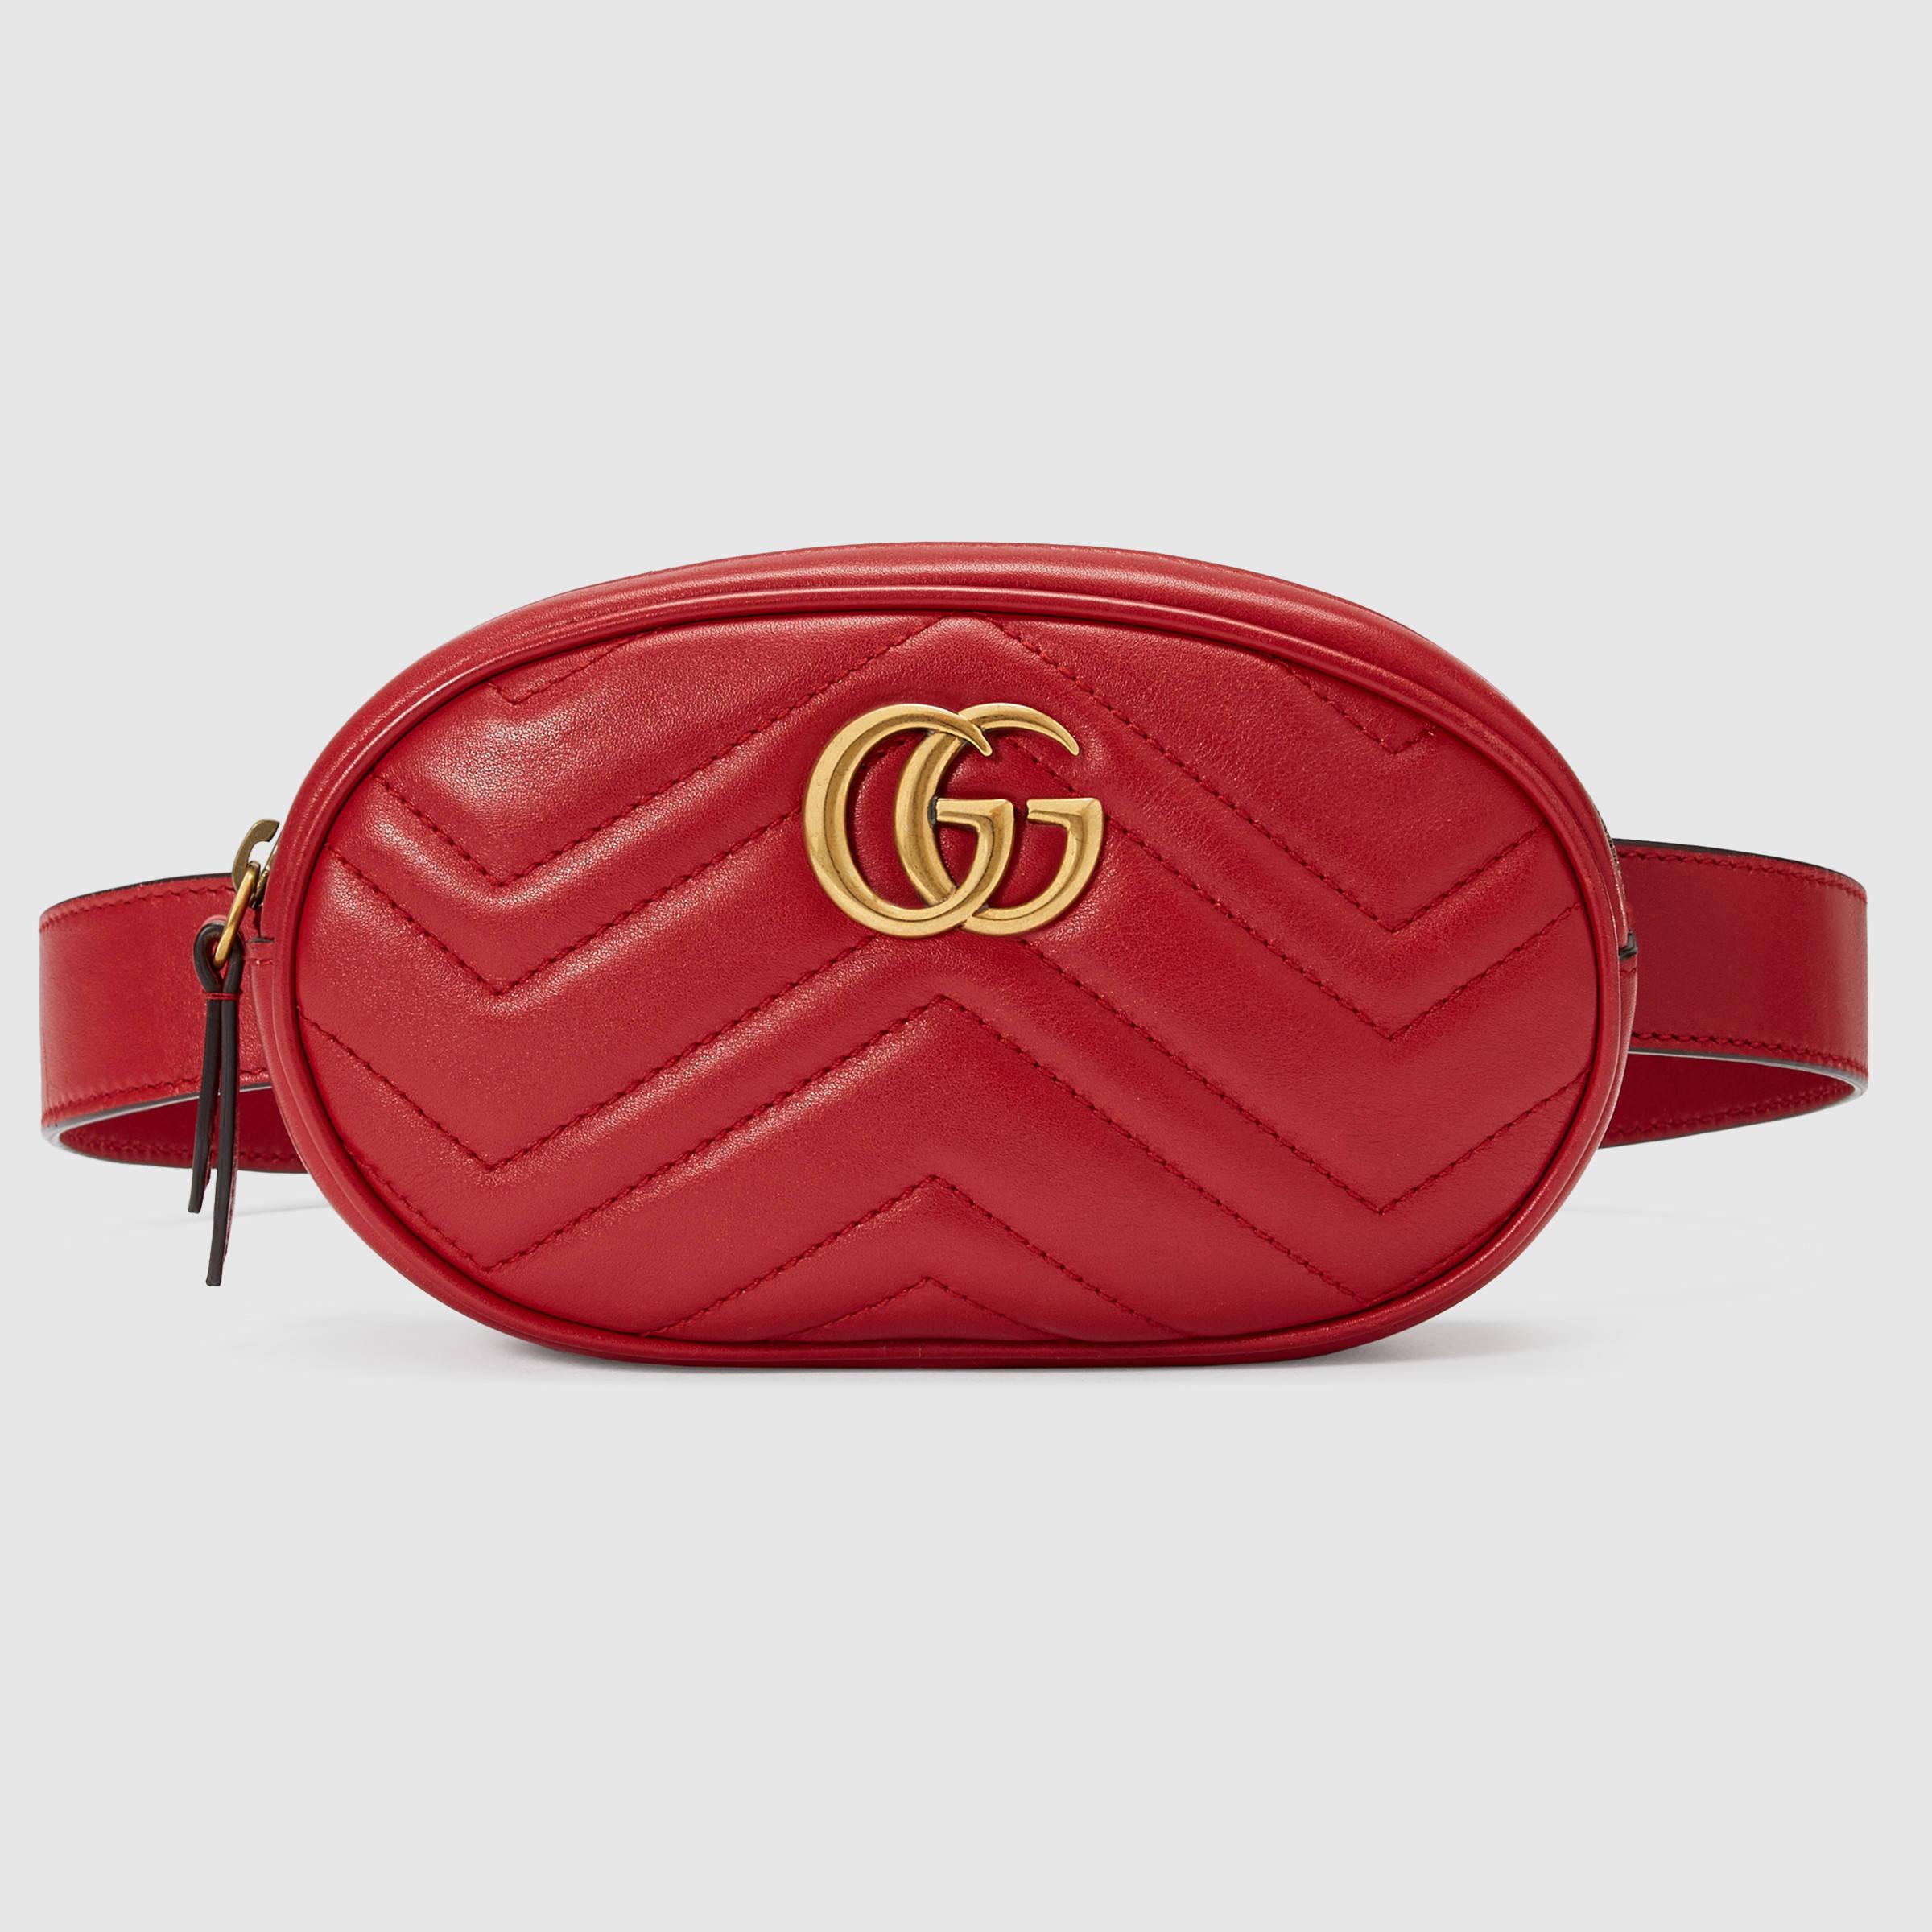 Red Gucci Belt for Men | Gucci Emblem | Red Gucci Belt